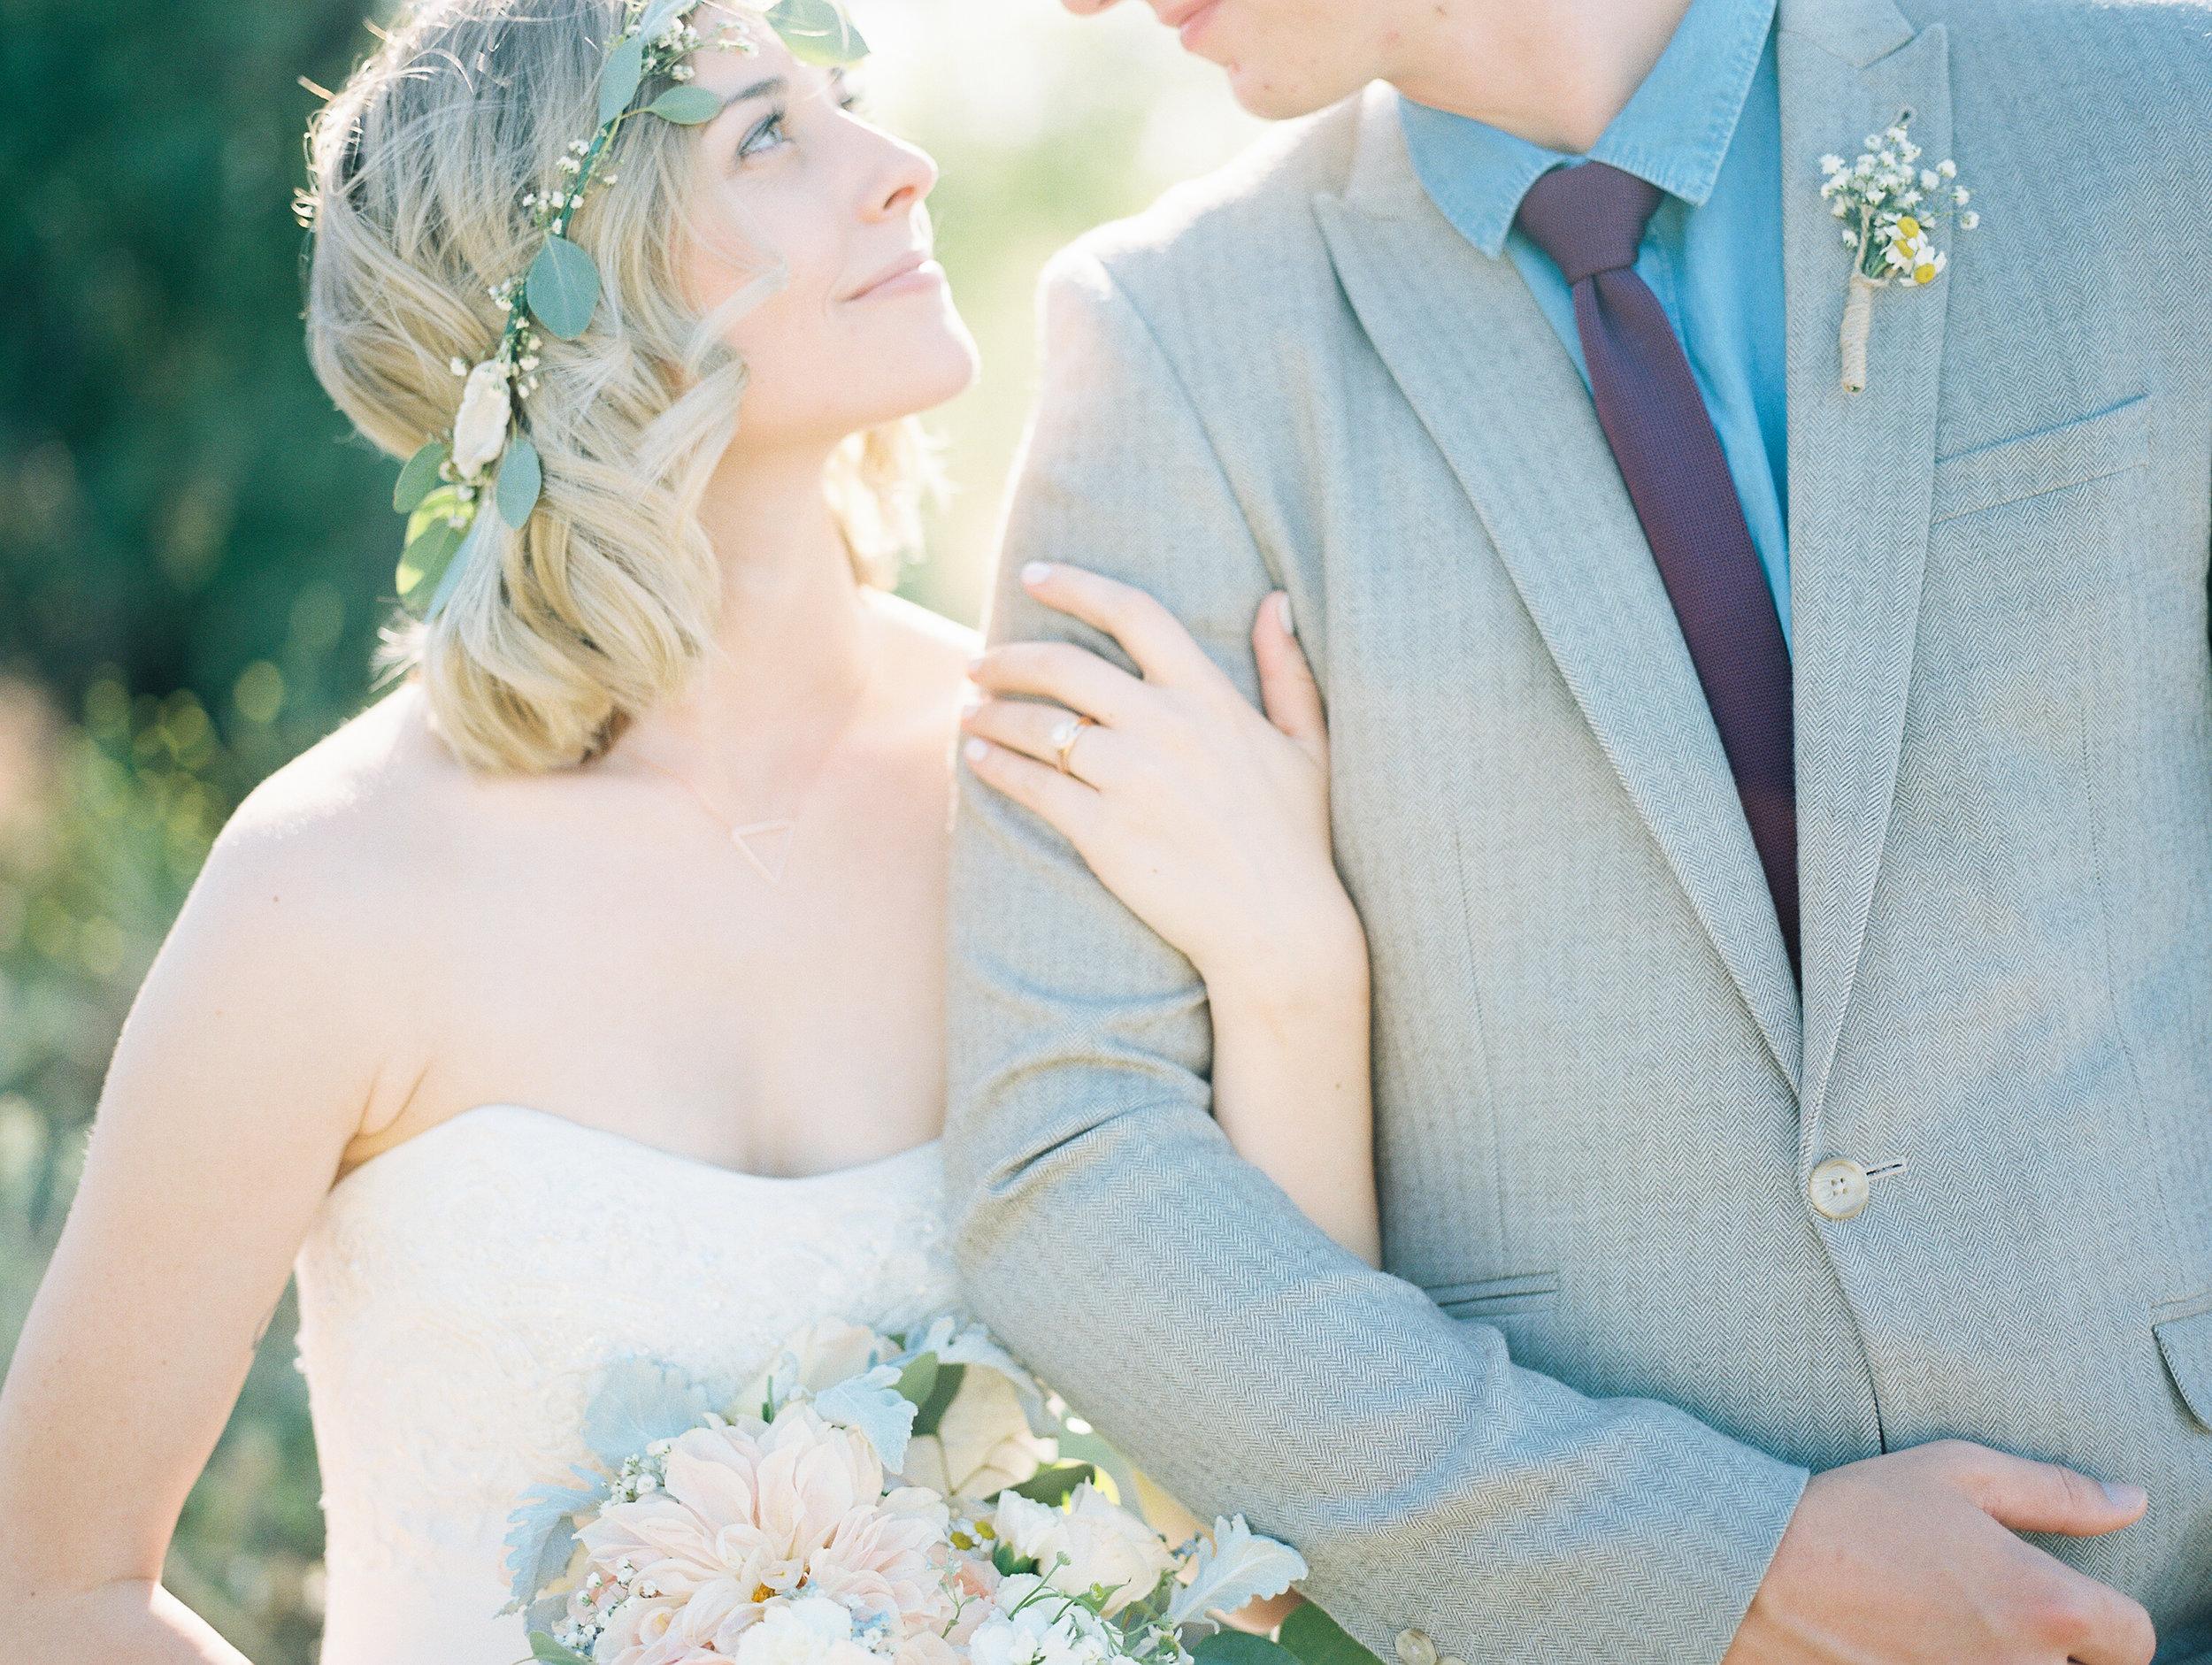 clayton+kennedy-married-filmscans-12.jpg